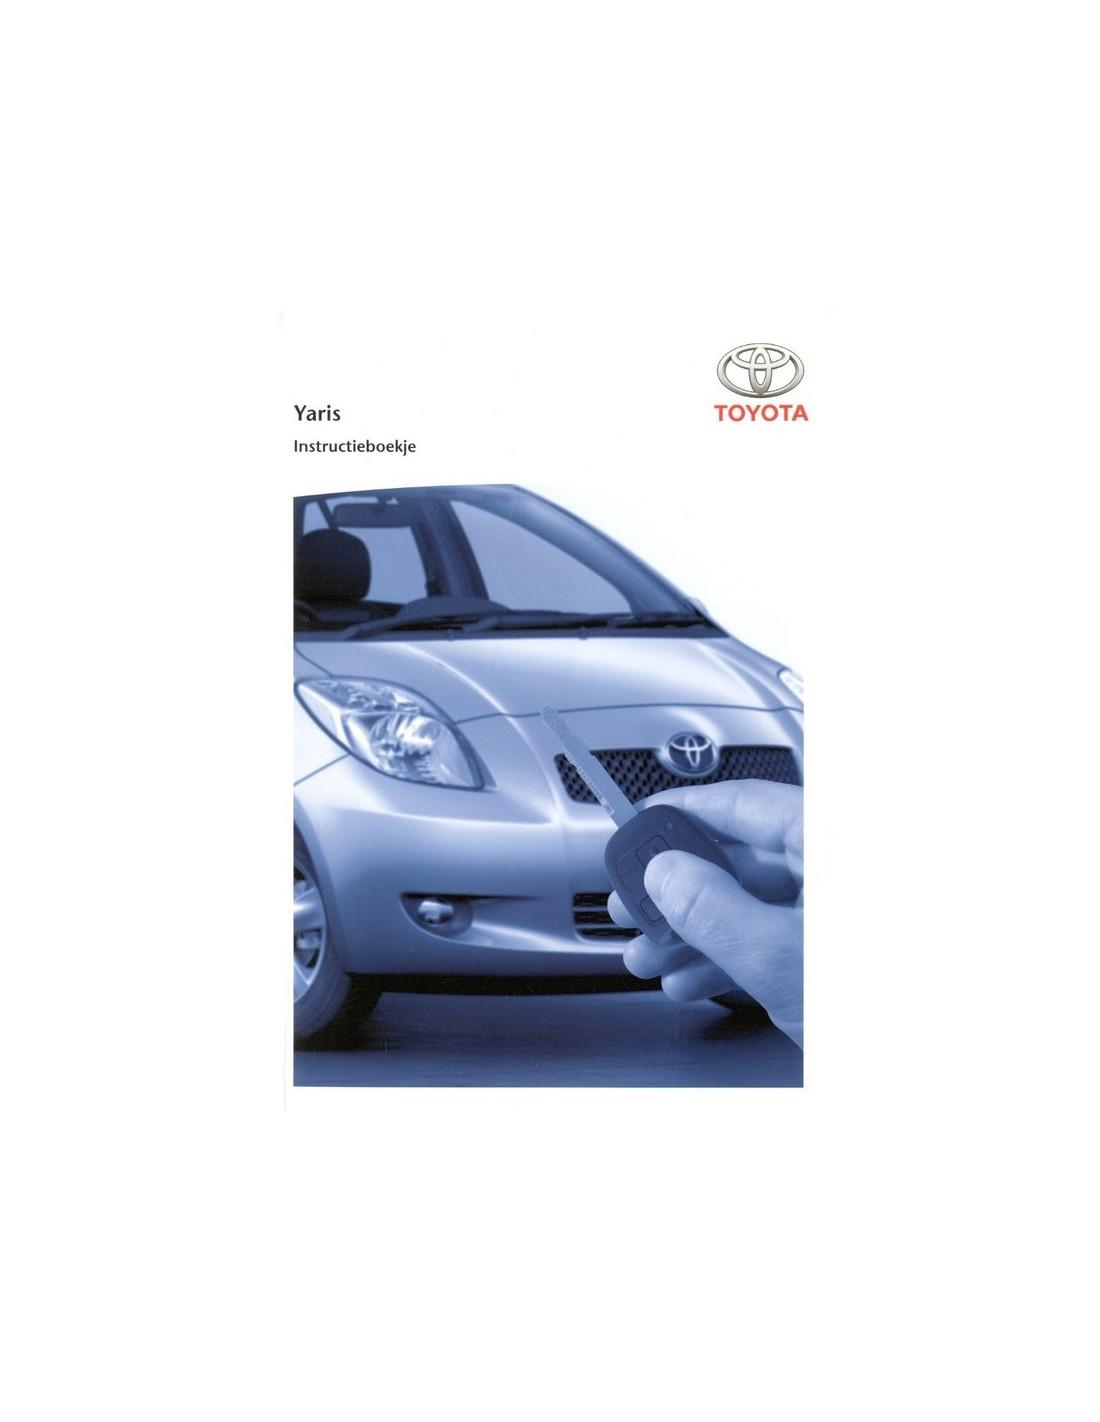 2005 Toyota Echo Owners Manual Pdf